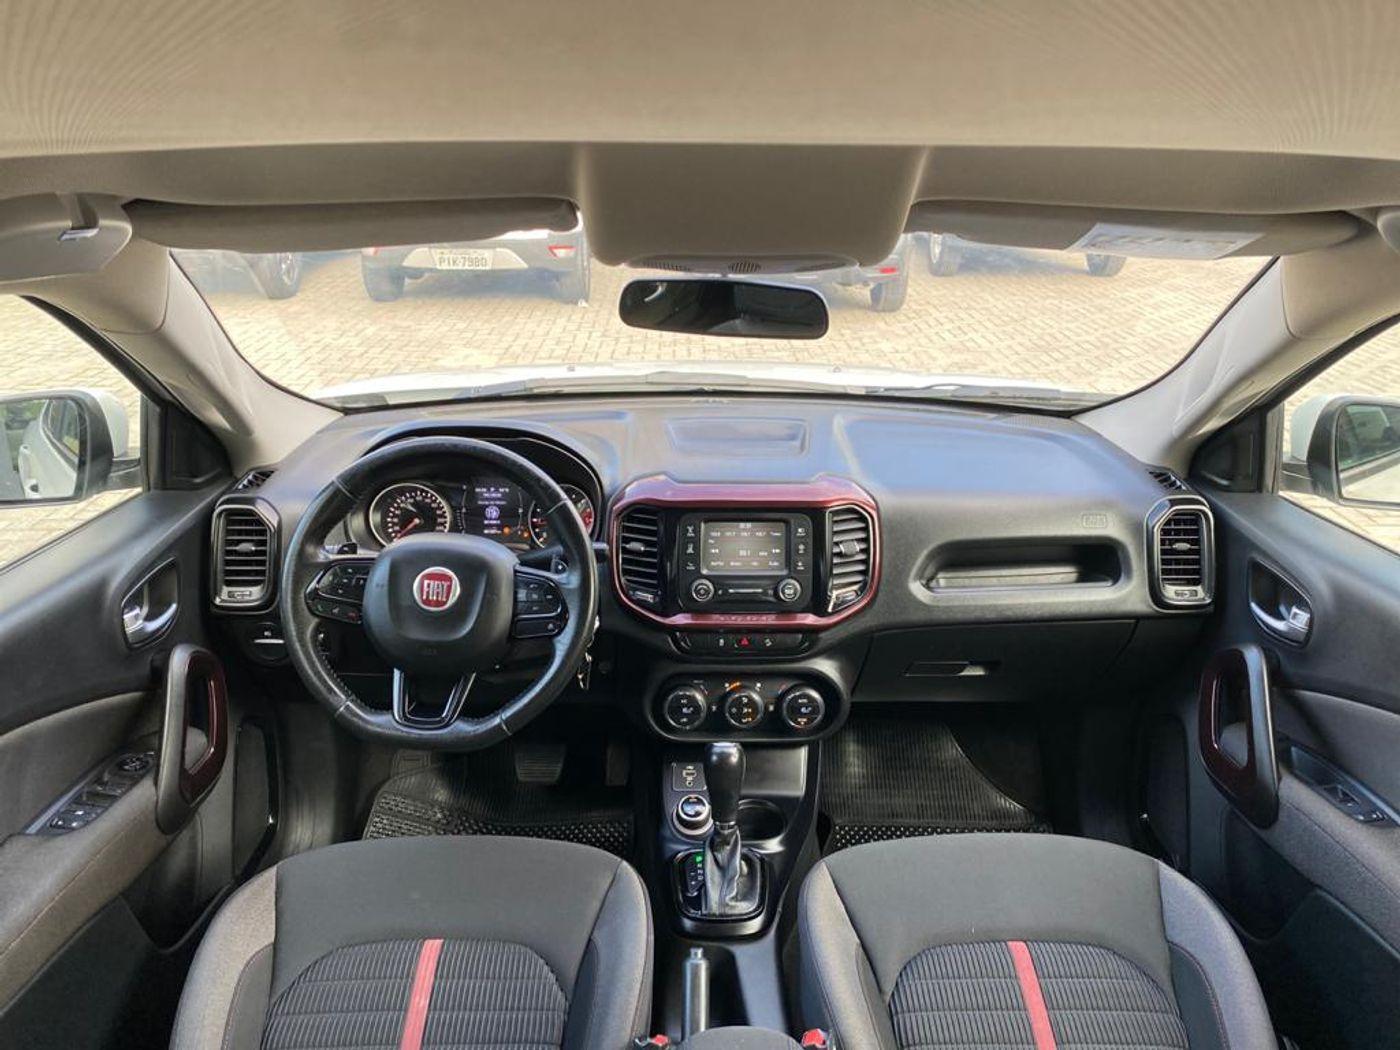 Fiat Toro Freedom 2.0 16V 4x4 Diesel Aut.